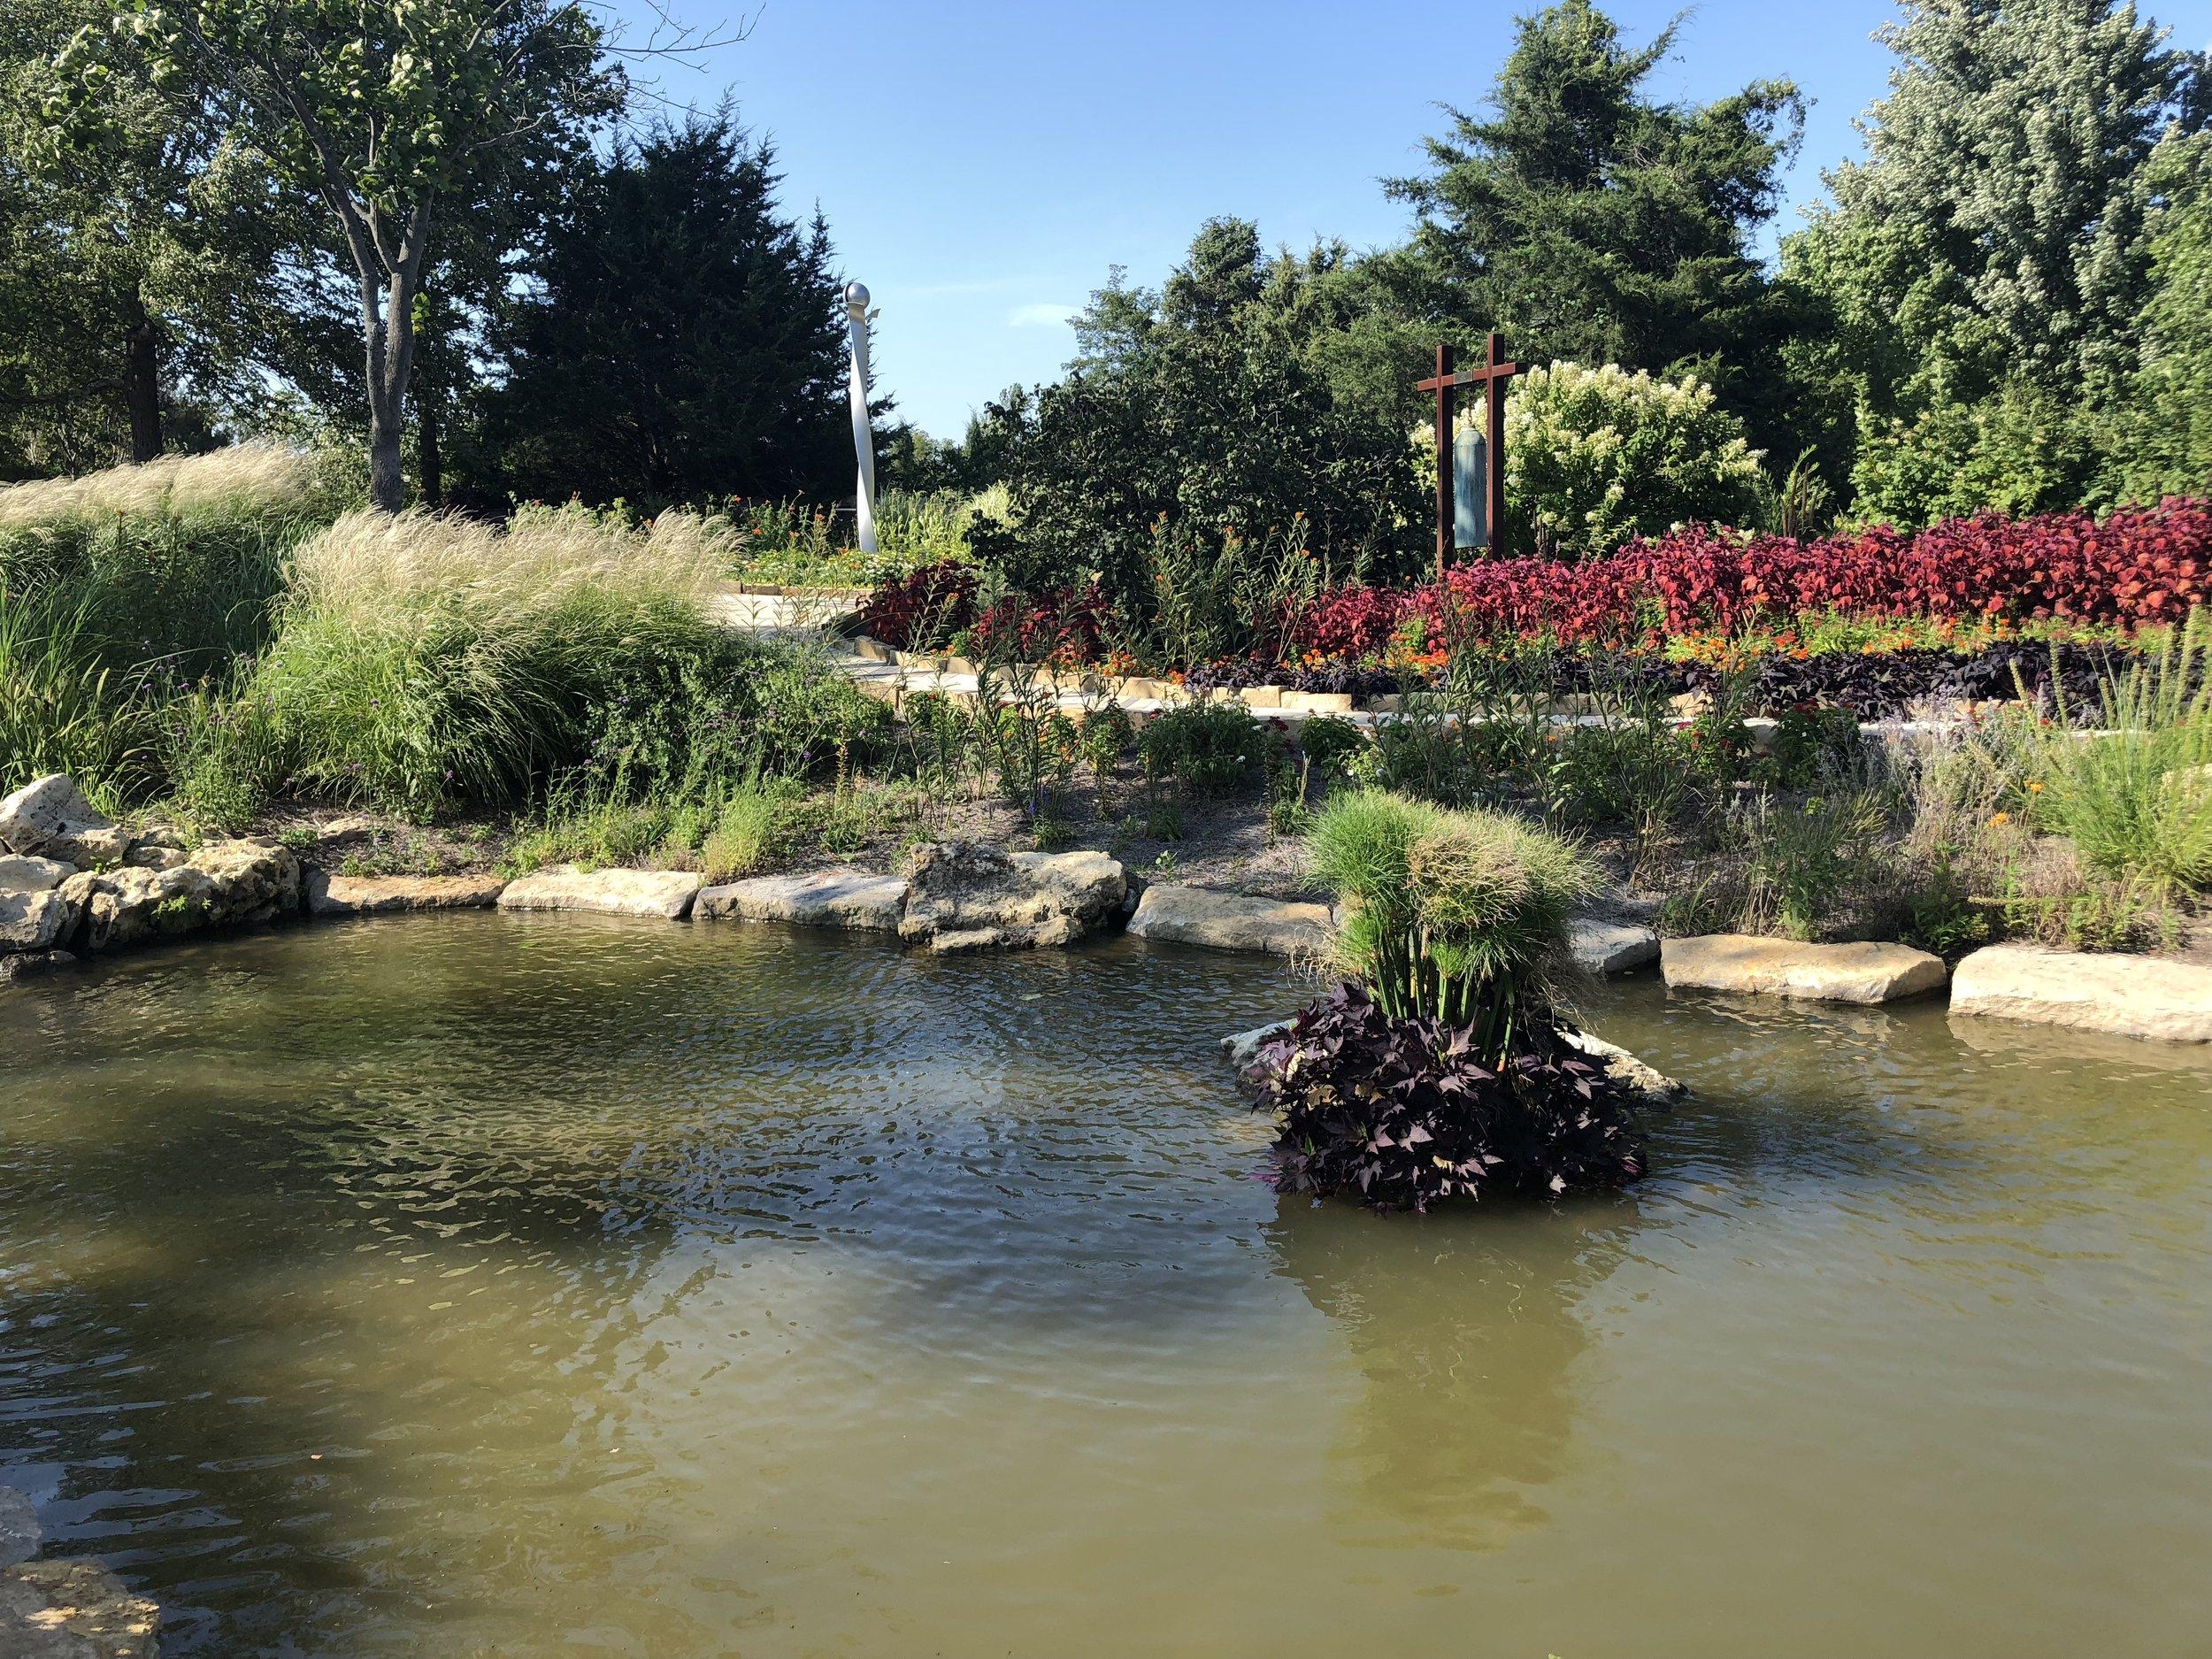 Photo taken by Samantha McHenry, Kansas City Arboretum, August 2018.